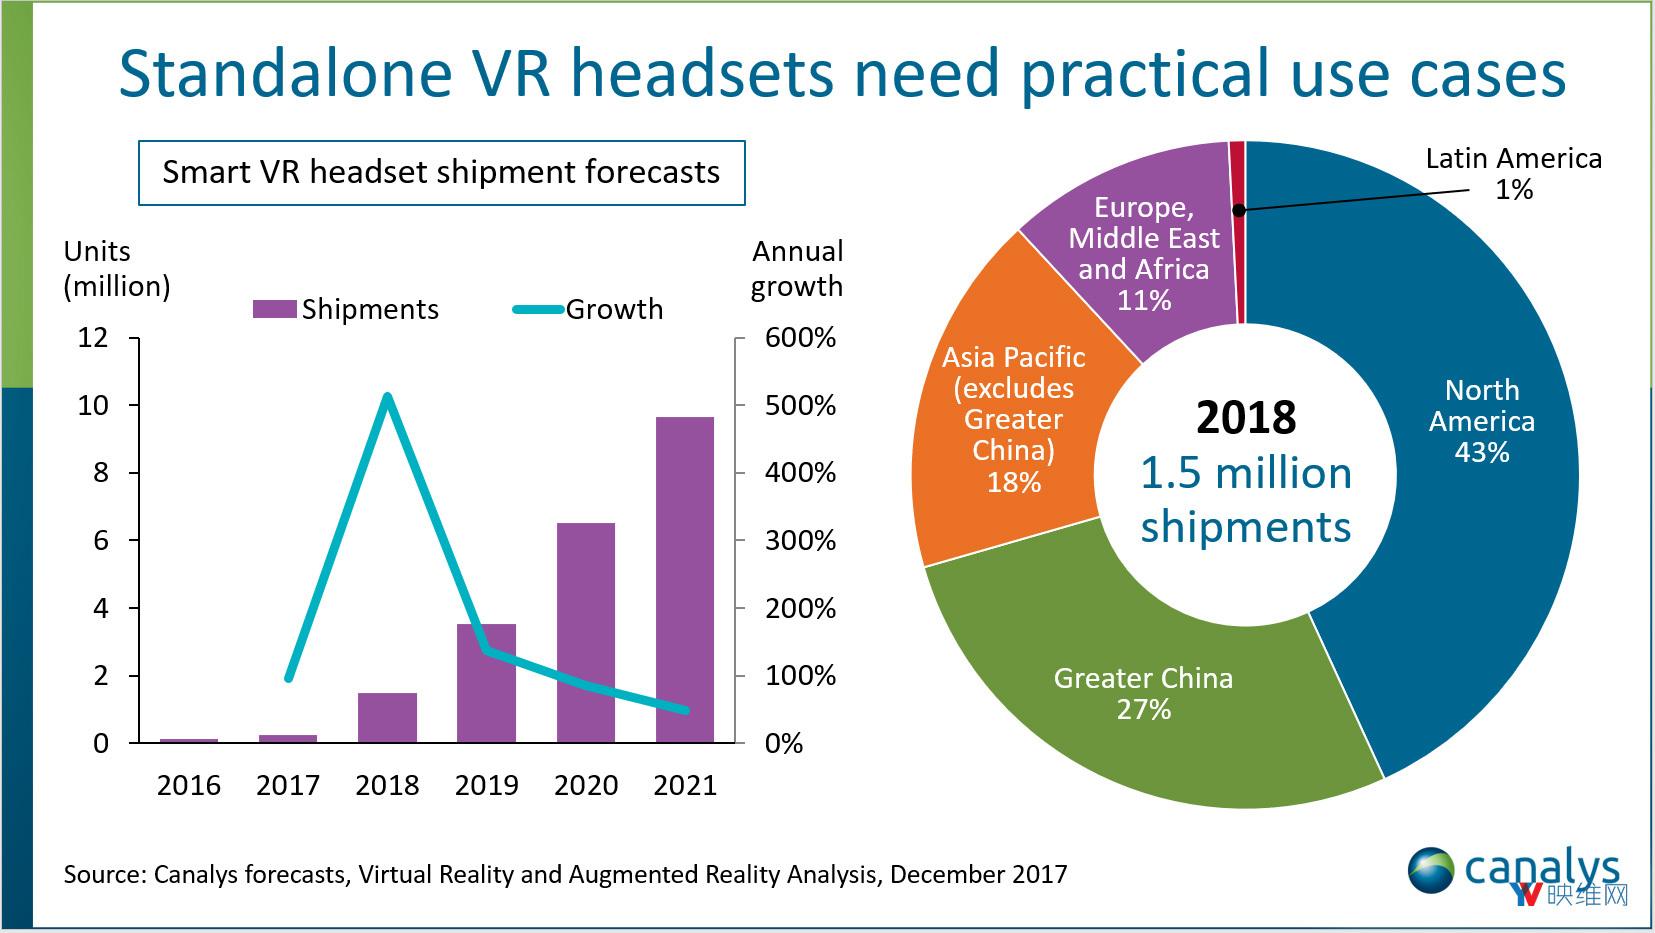 Canalys预测:2018年VR一体机发货量将超过150万台